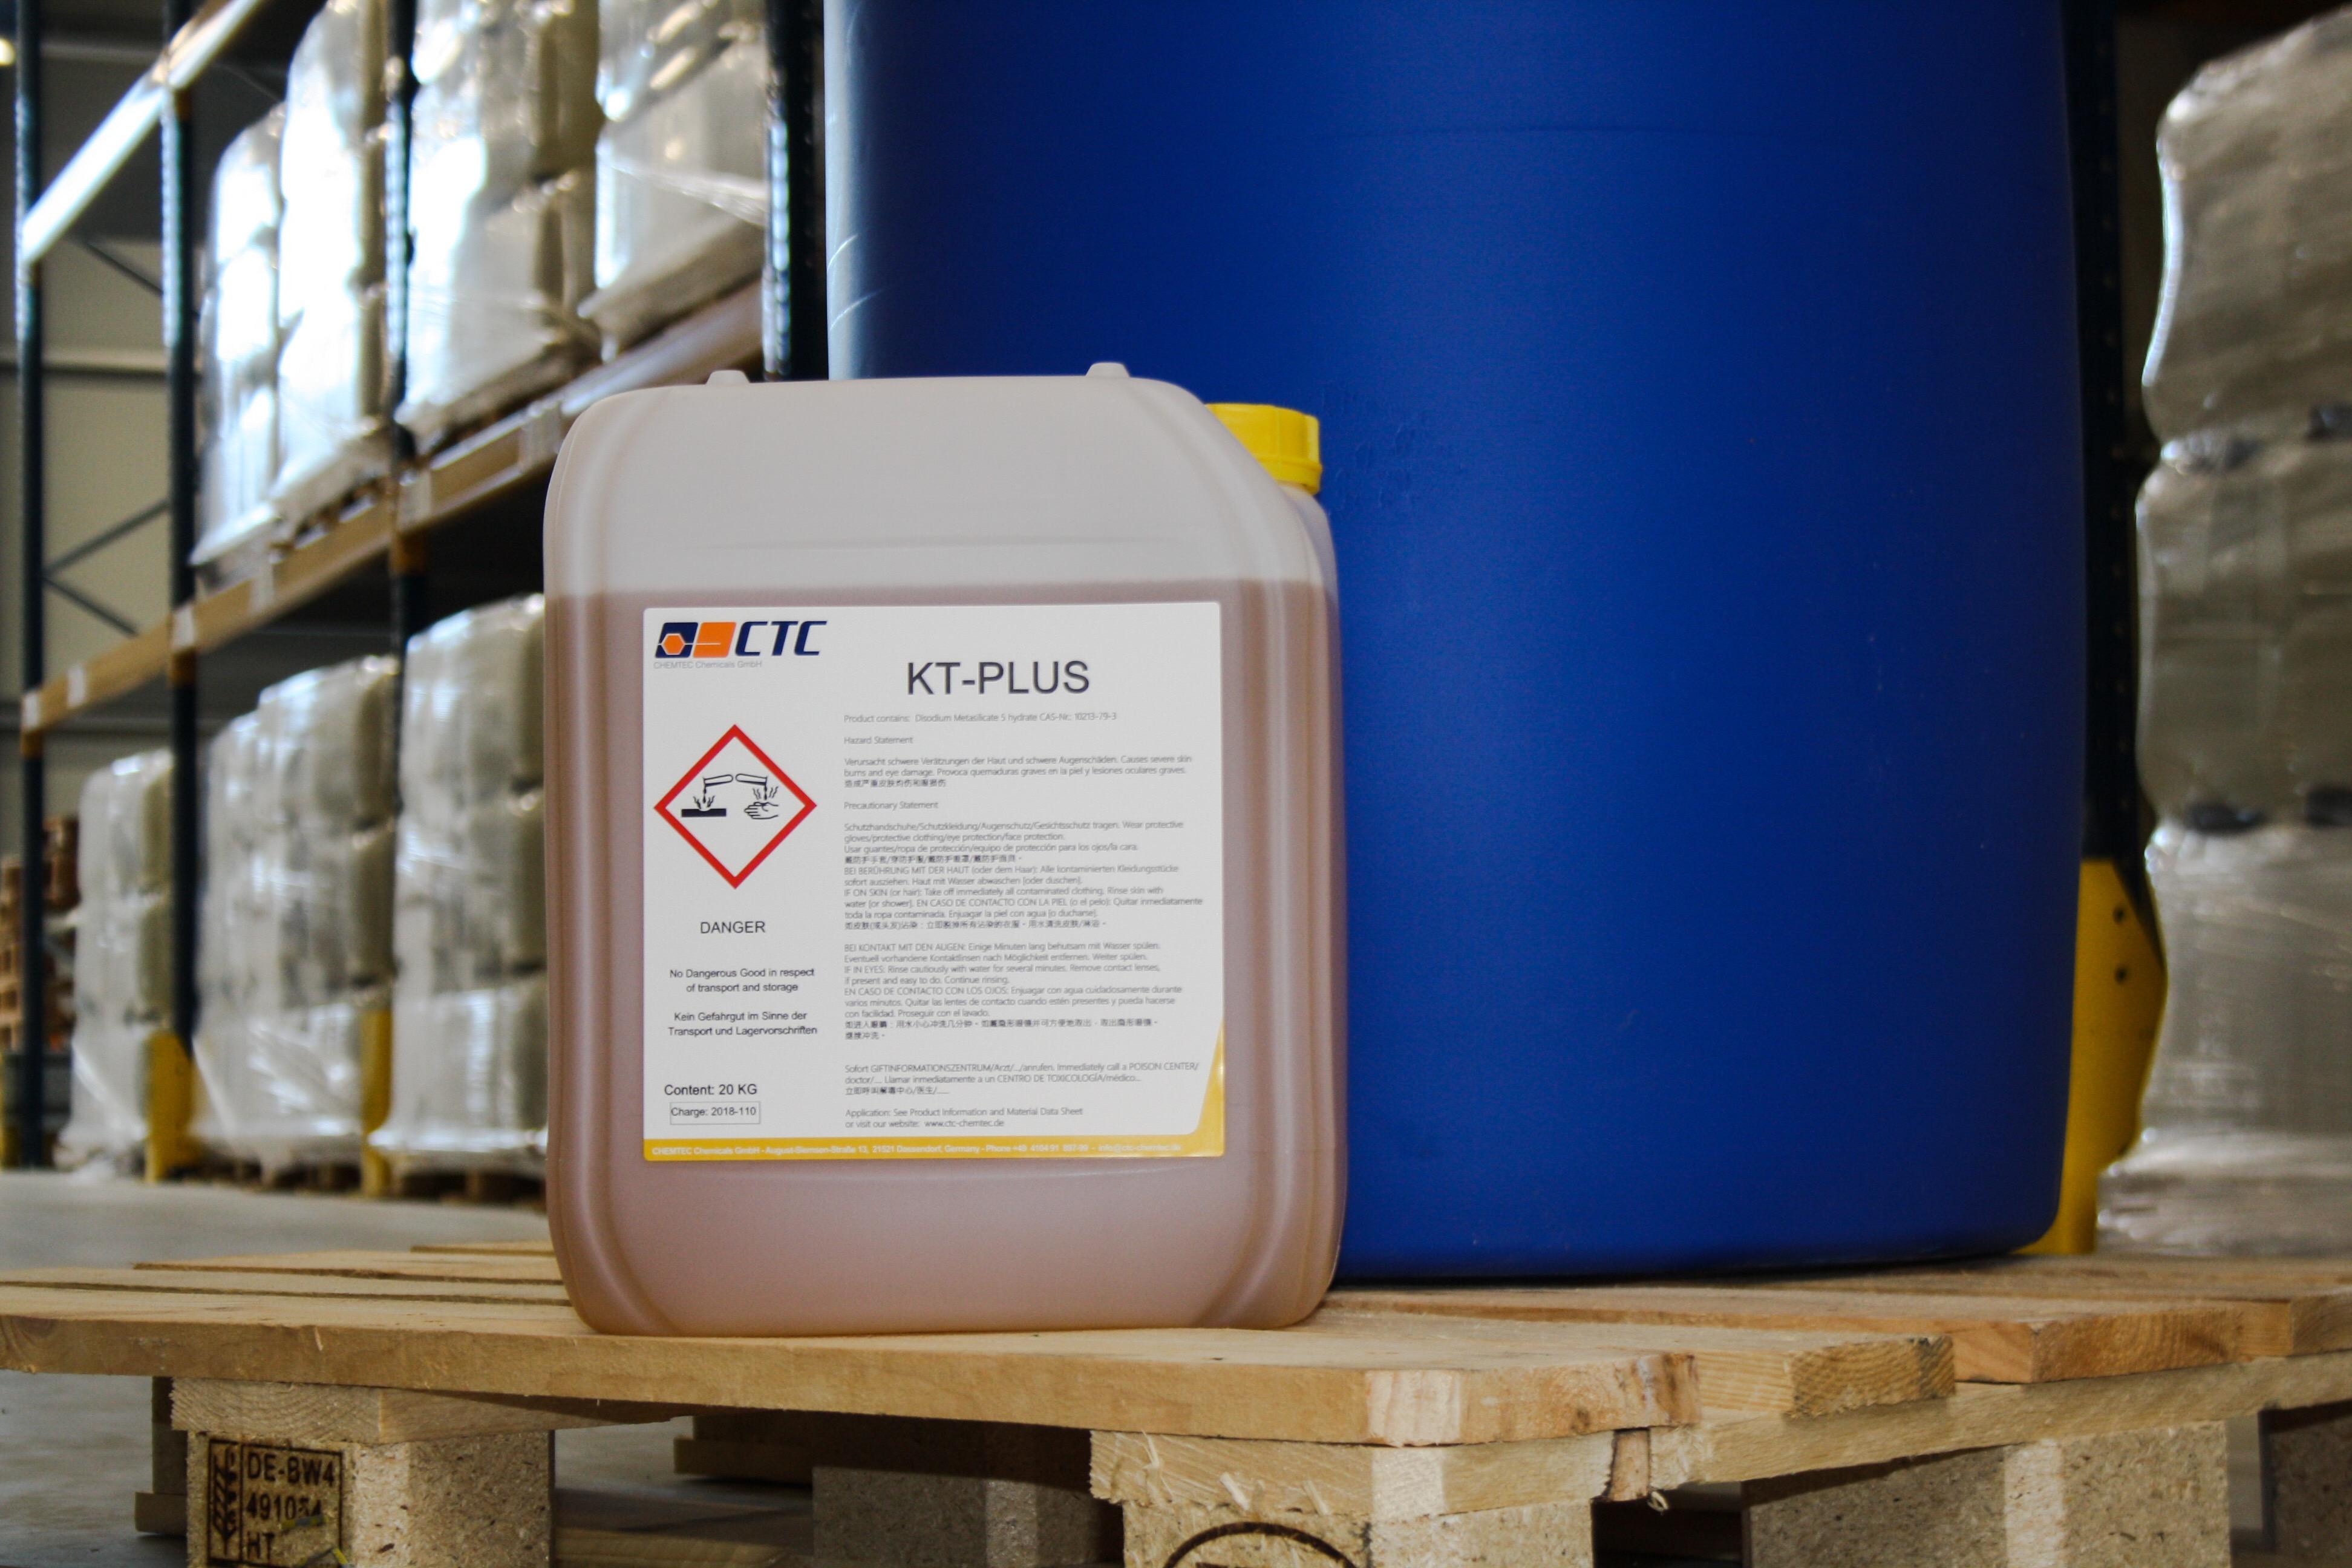 KT-Plus – CTC Chemtec Chemicals GmbH